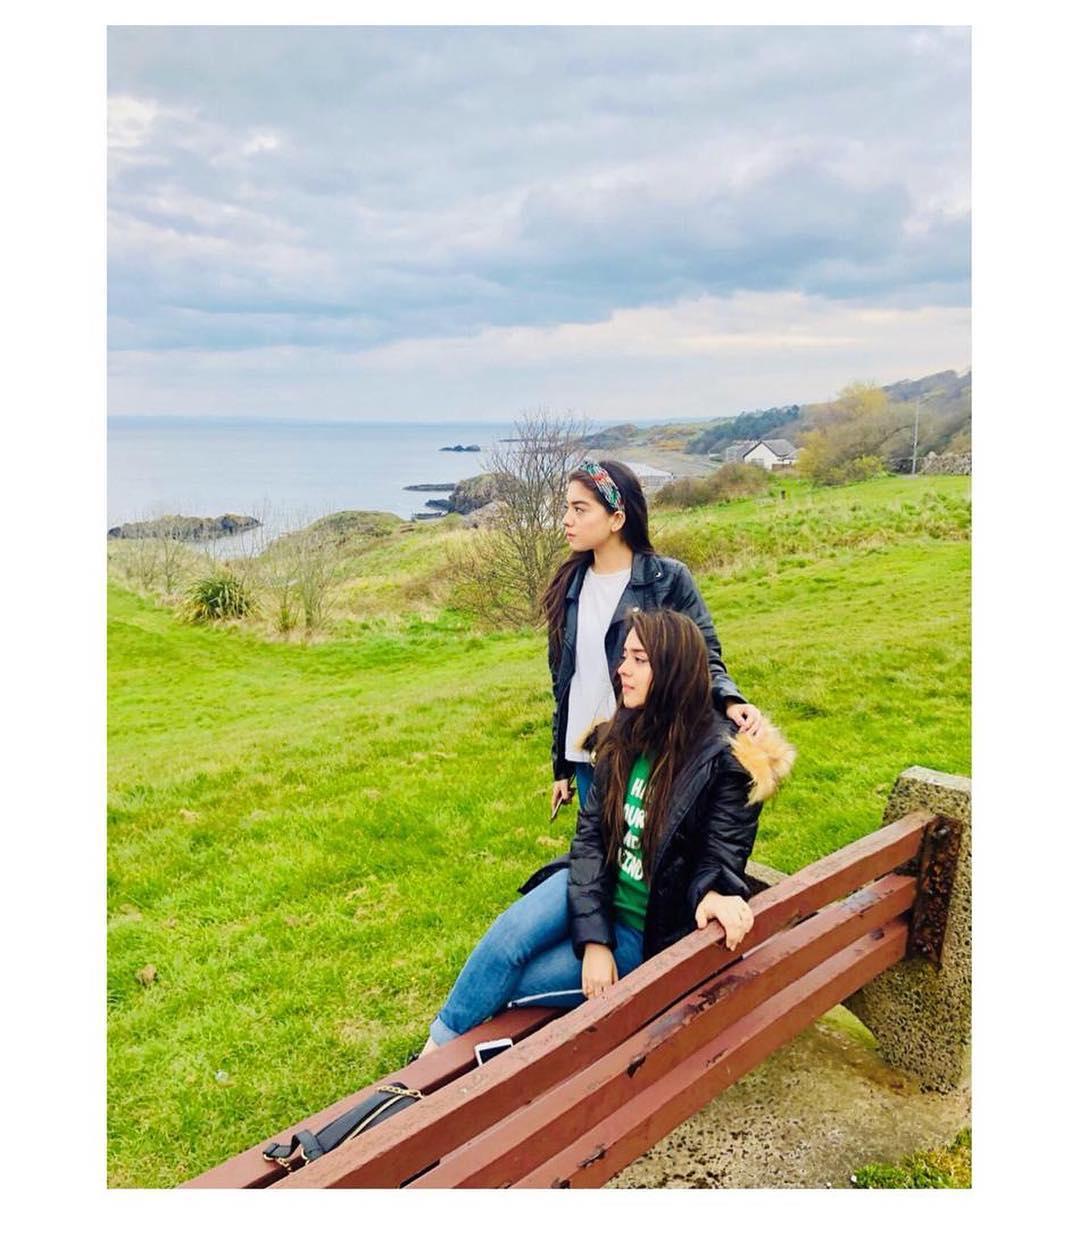 Awesome Sisters Arisha Razi and Sarah Razi in Galsgow UK